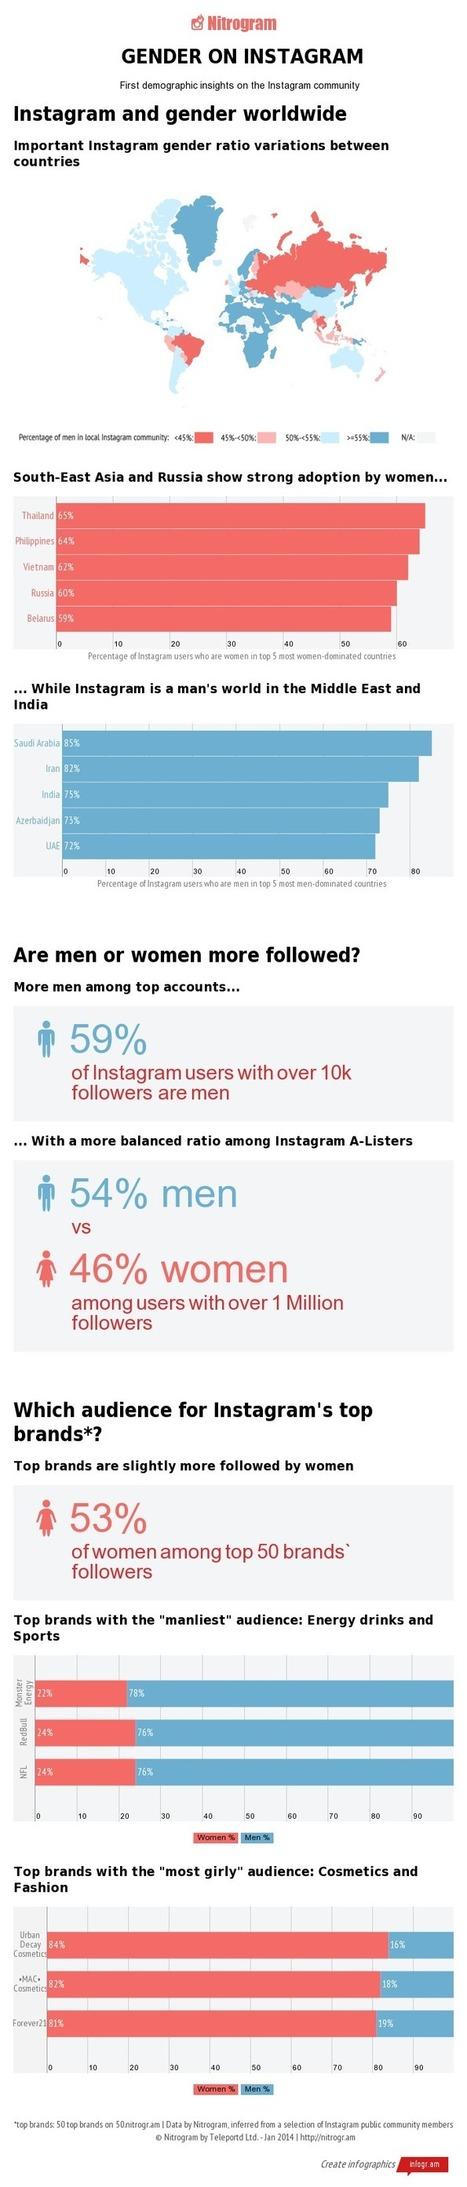 Is Instagram Becoming Man's Best Friend on Social Media? | 5 Star Social Media Marketing | Scoop.it